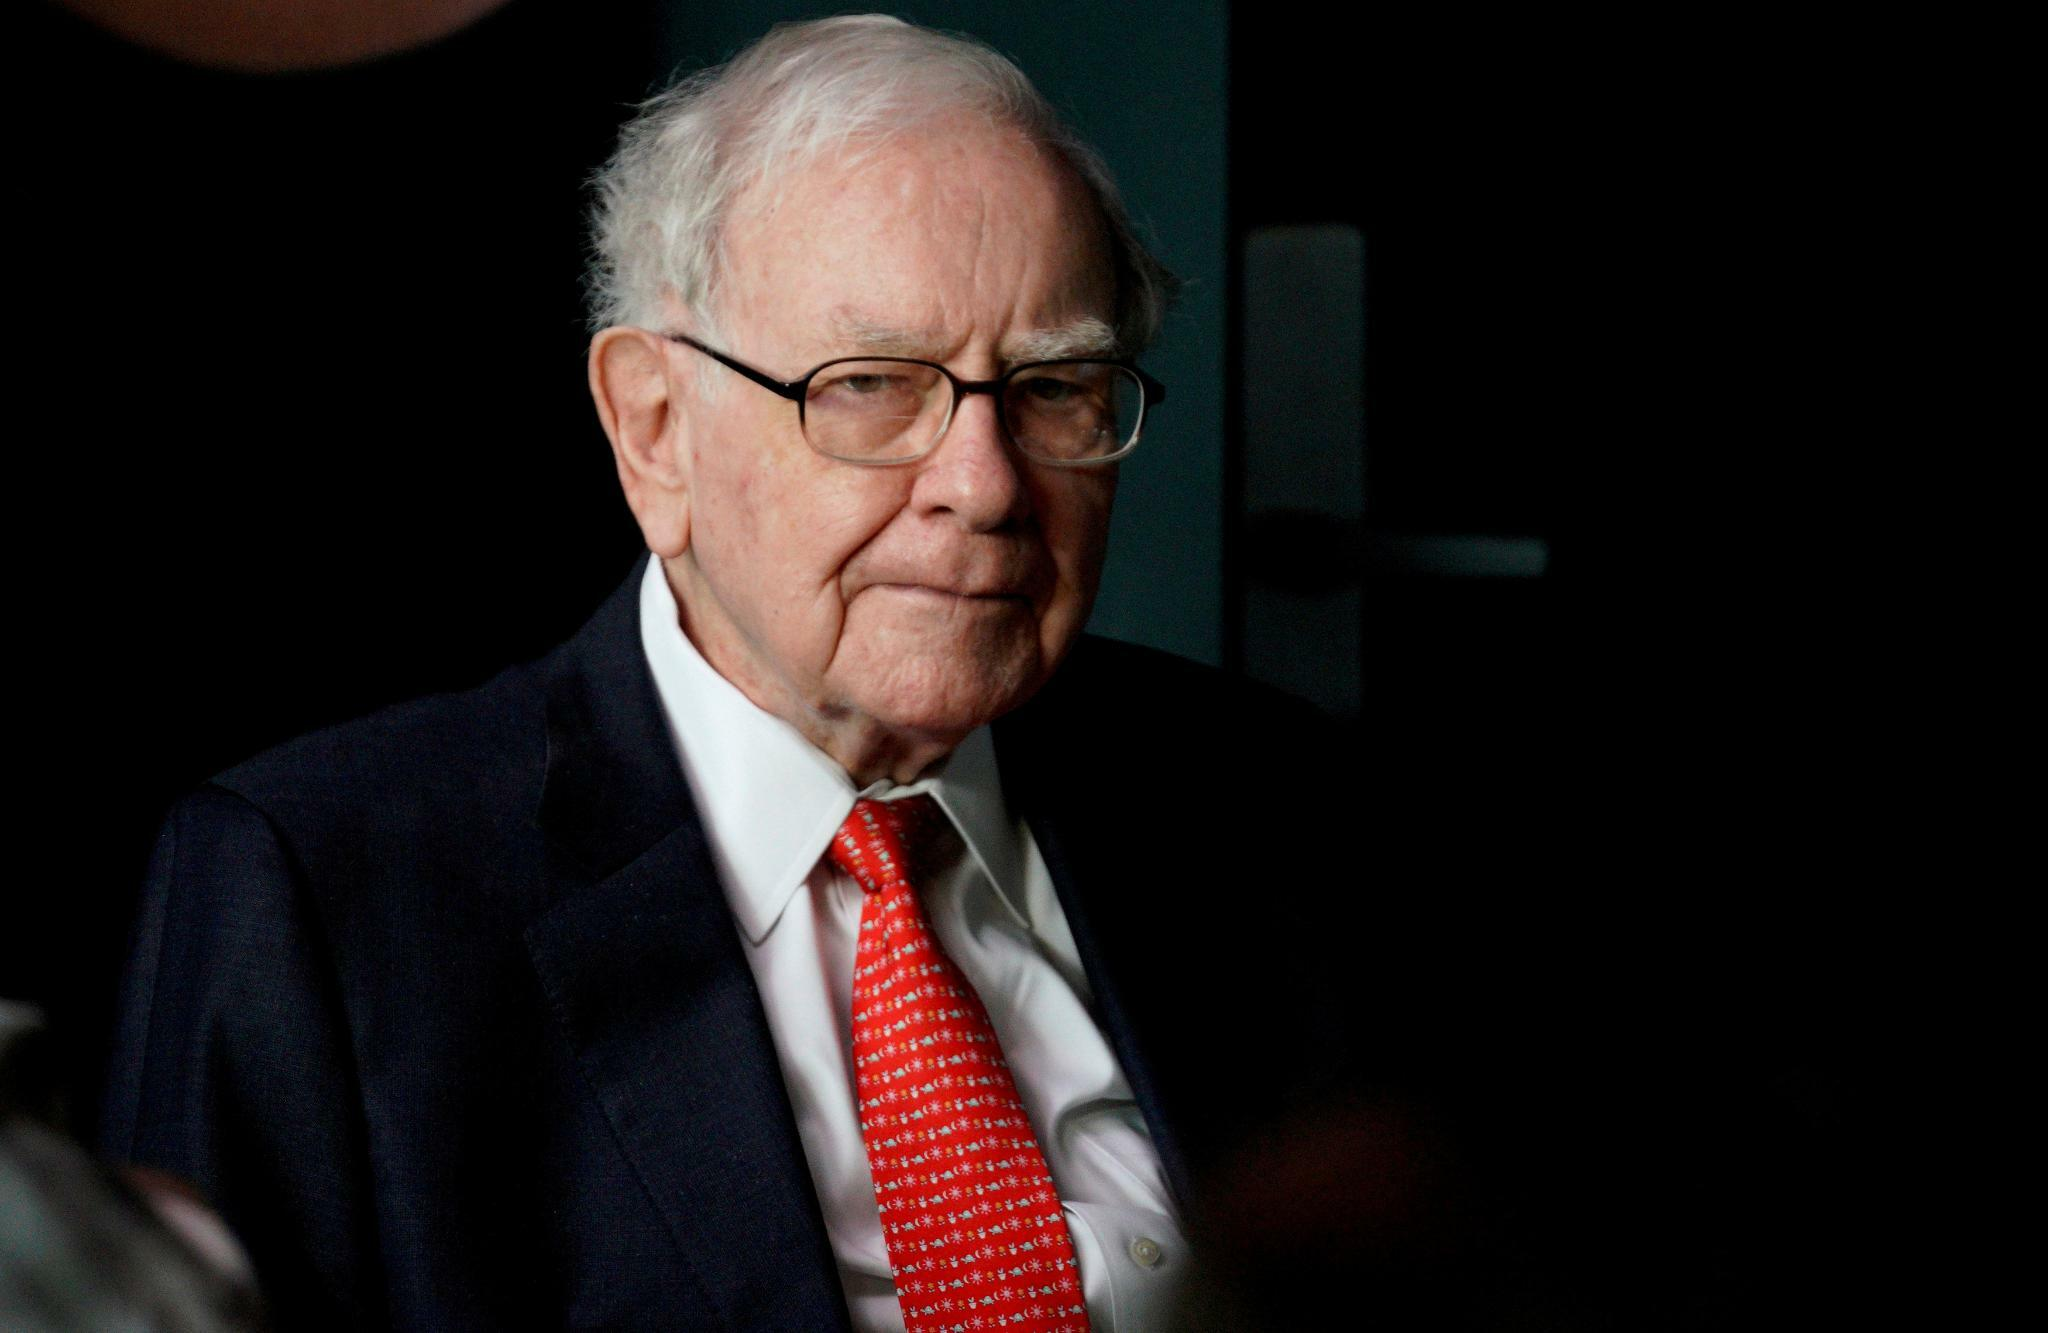 Buffett Wells Fargo Soll Ausserhalb Wall Street Nach Neuem Chef Suchen